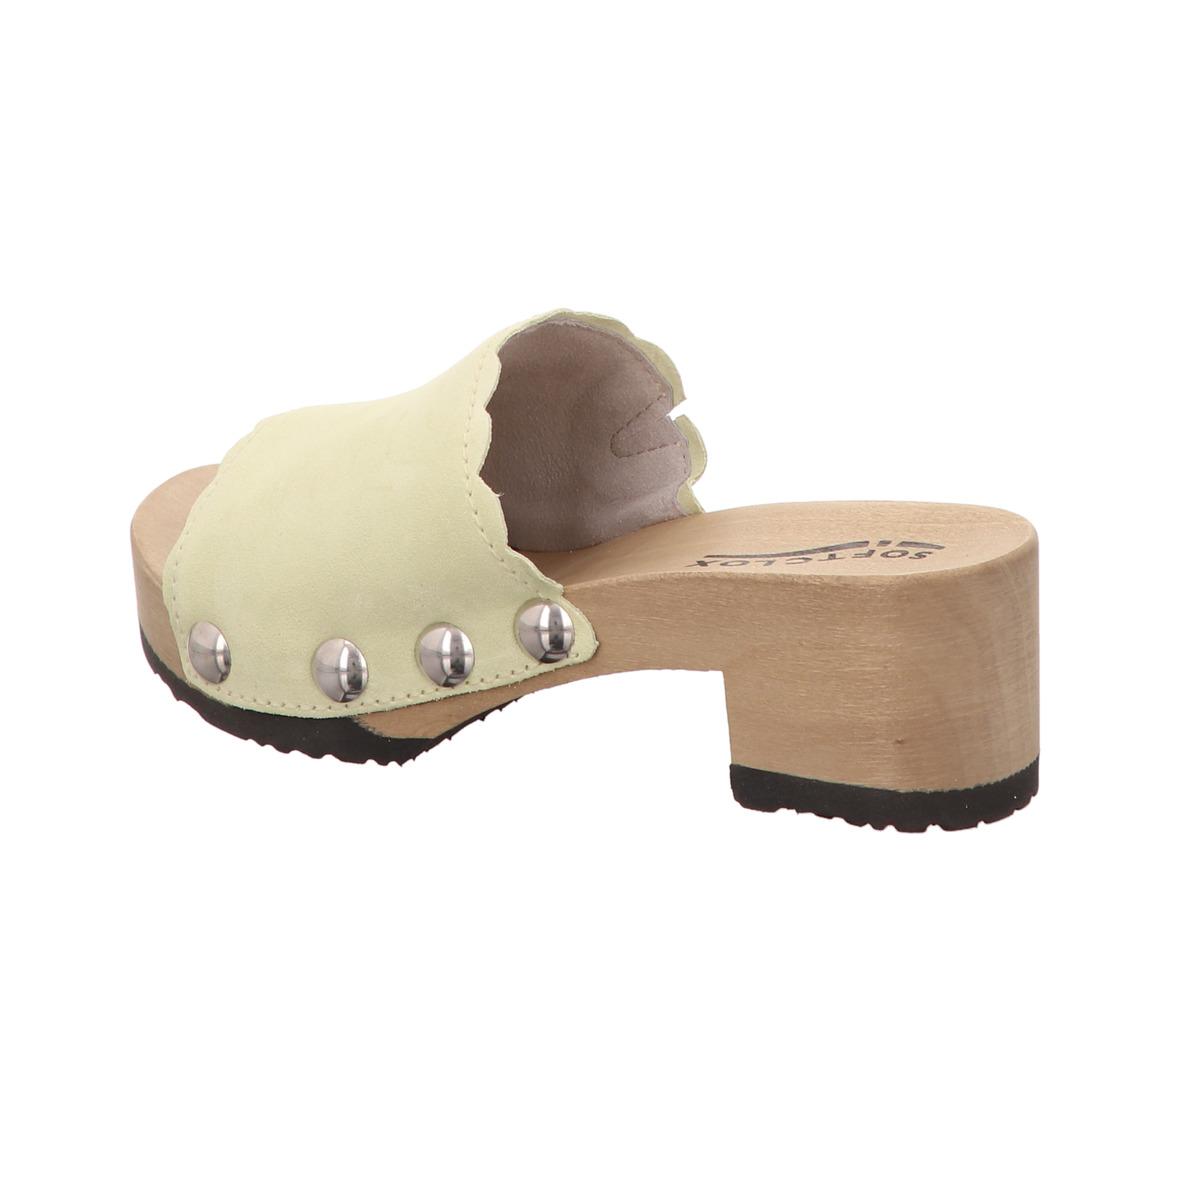 Softclox Pabla Camouflage S3420 Damen Schuhe offene Schuhe